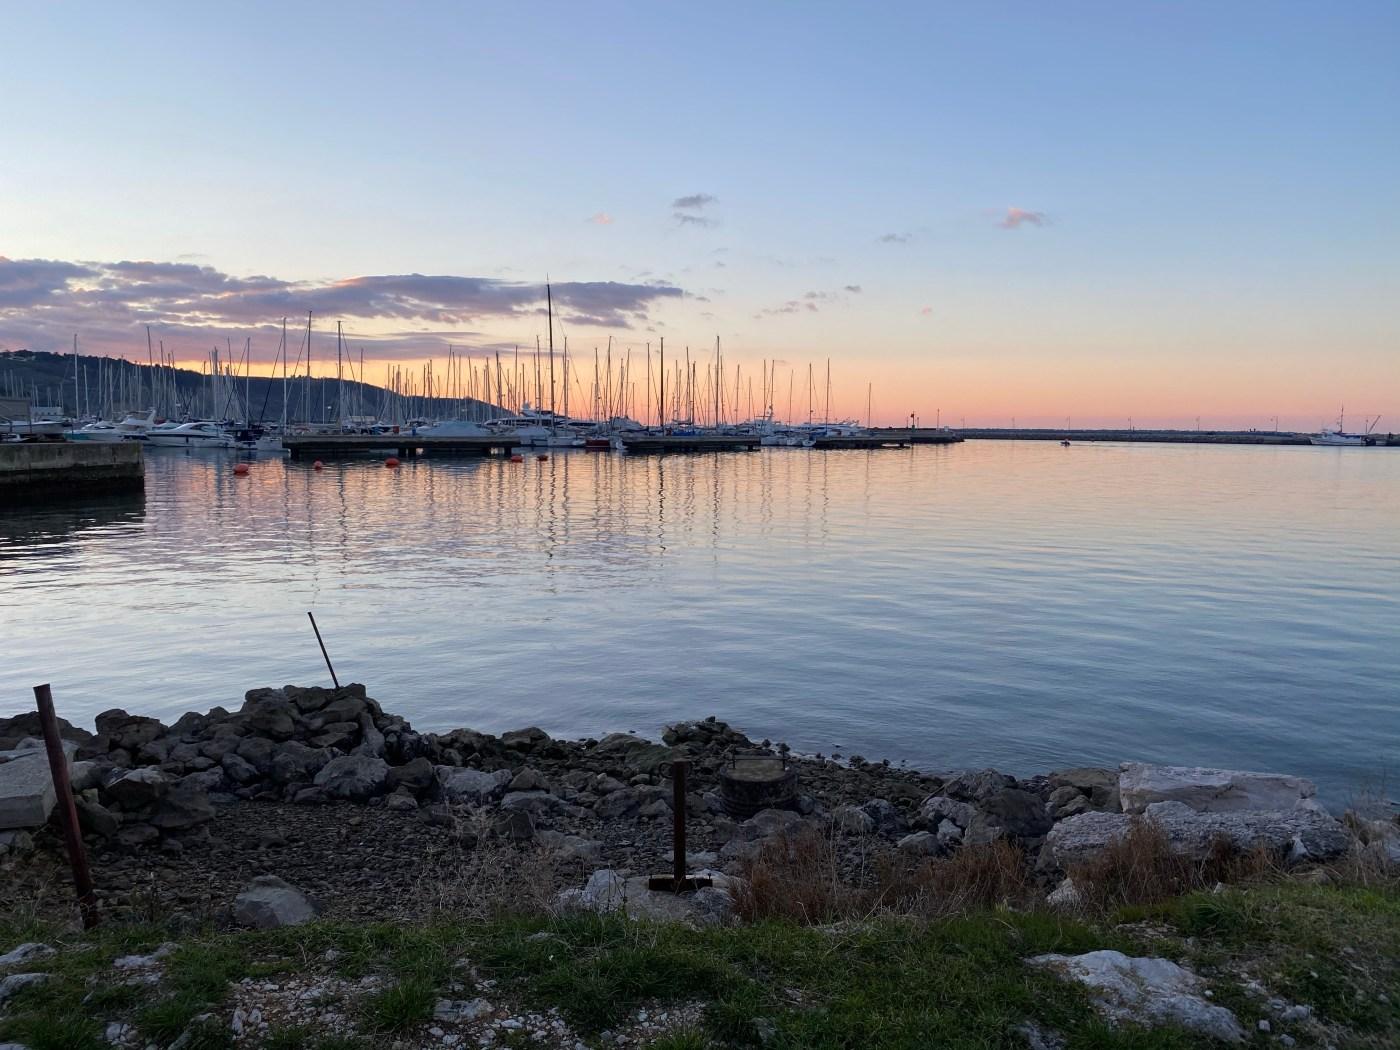 Boats, sea, sunset